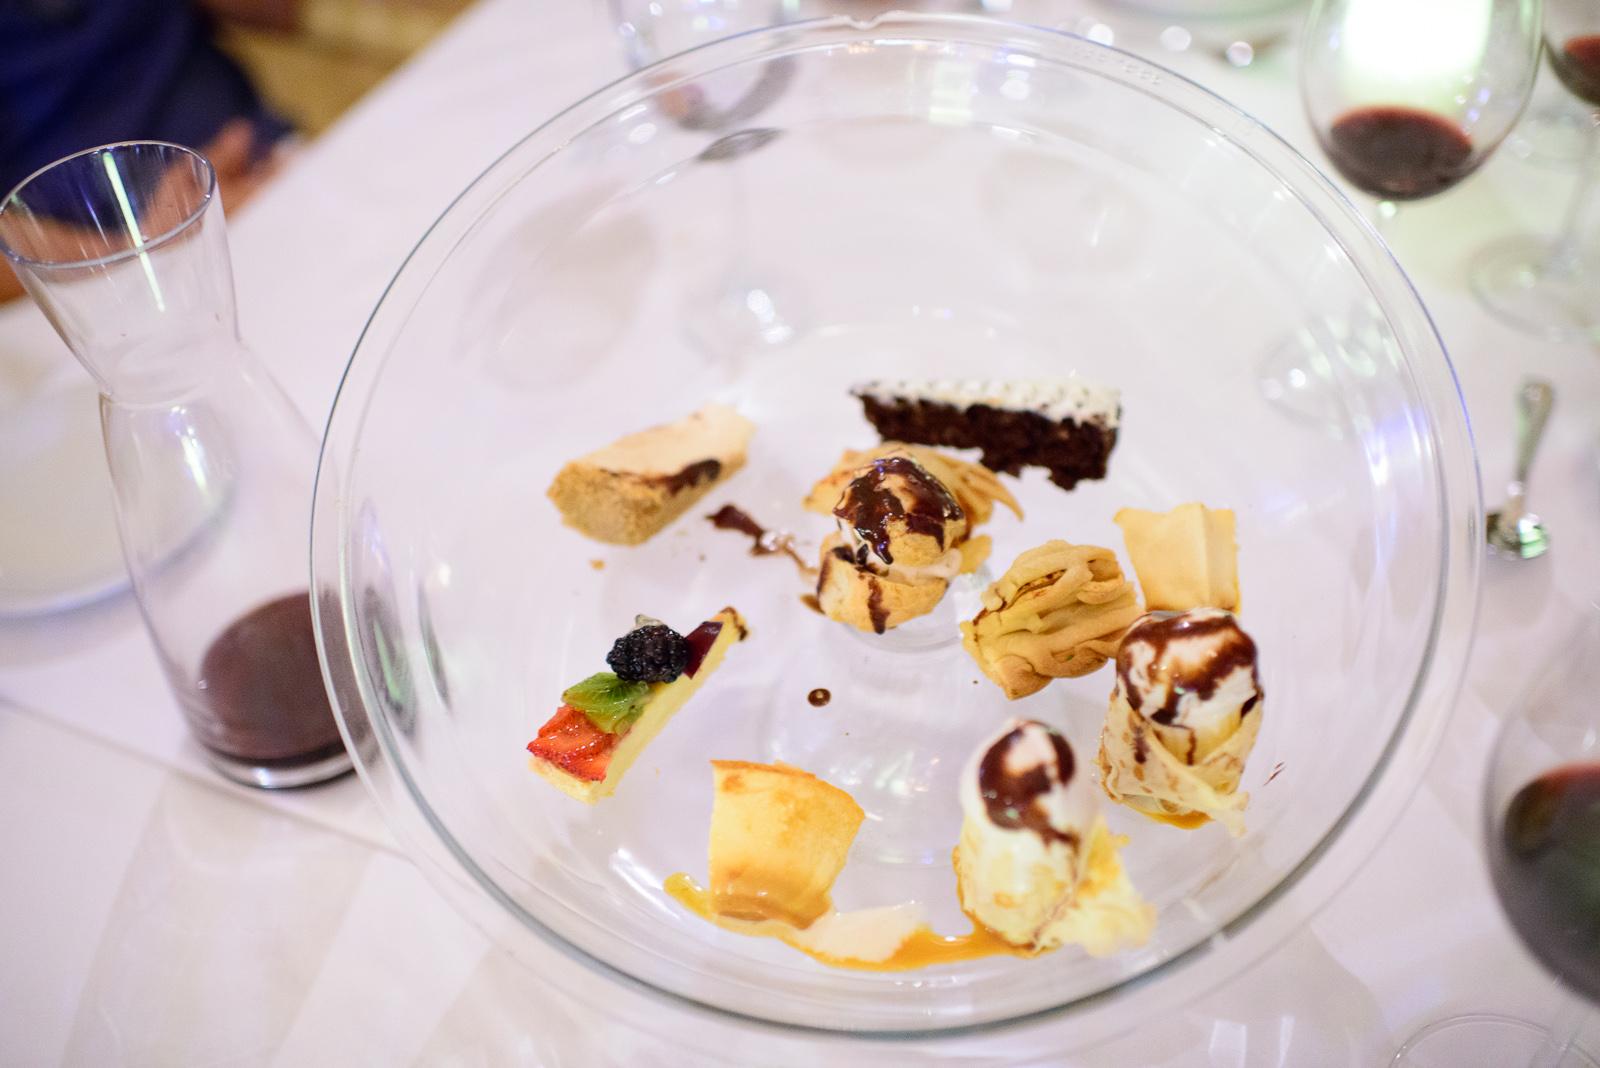 Assortiment of desserts